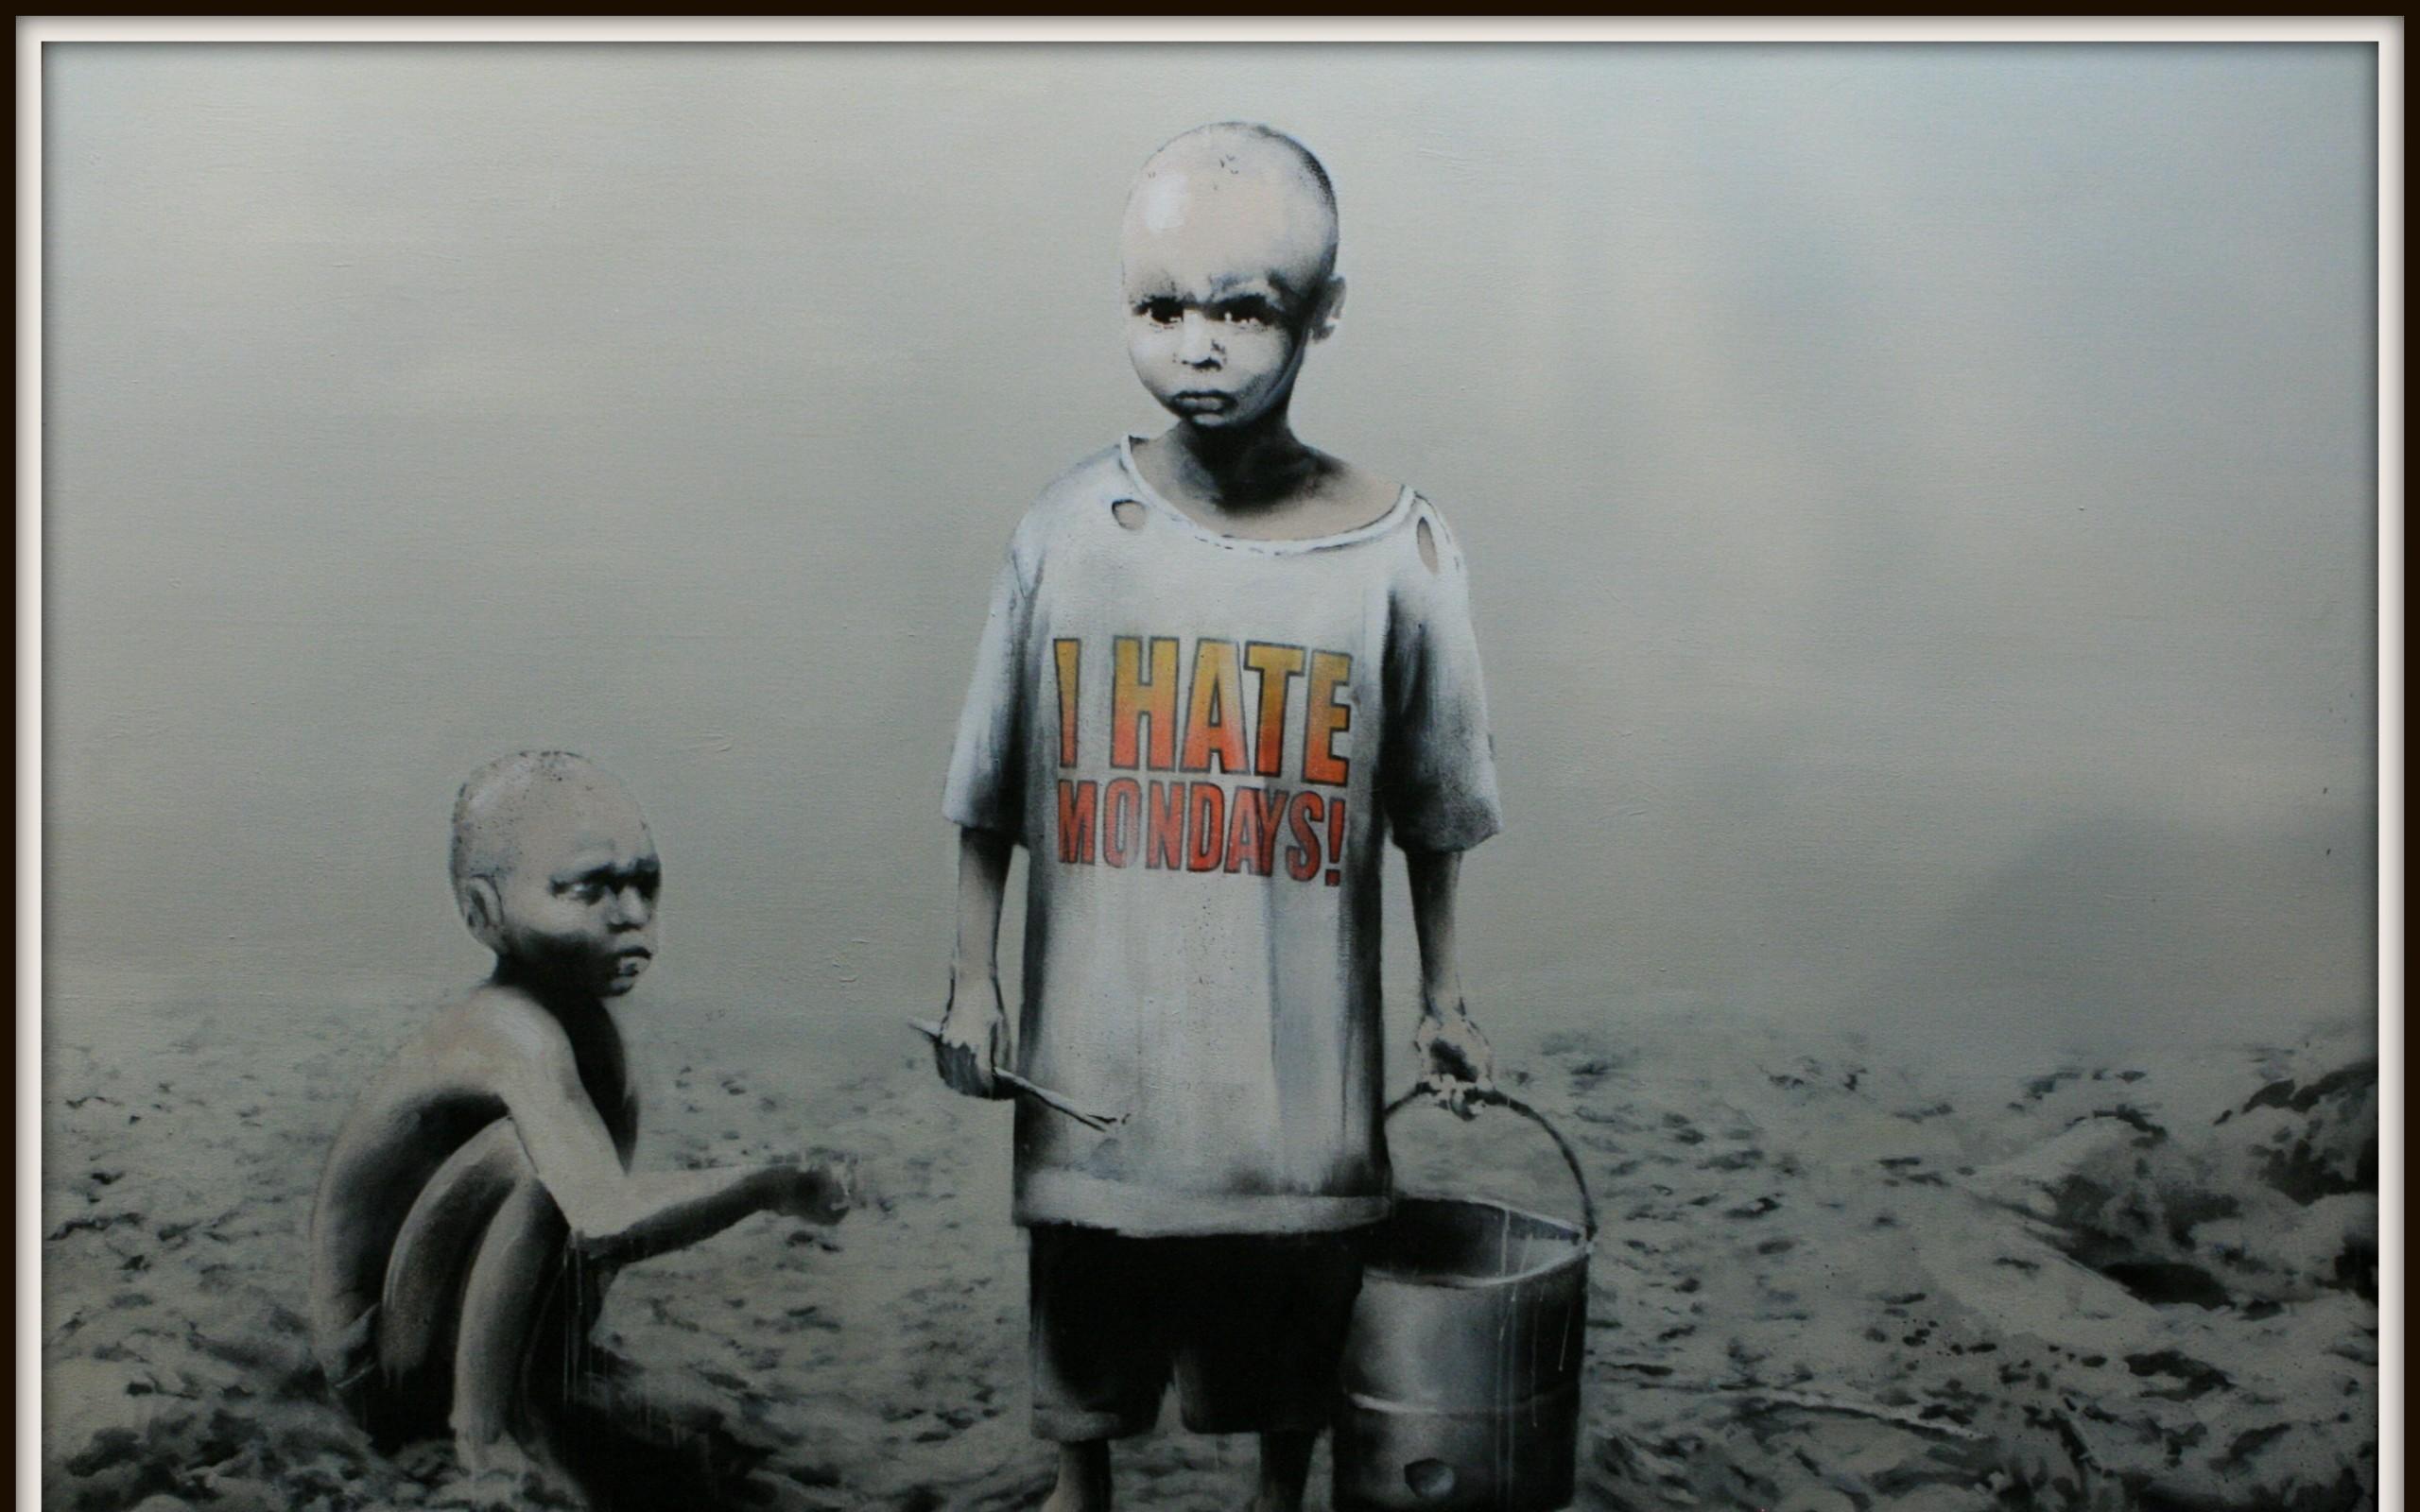 … banksy wallpaper ipad image gallery hcpr …